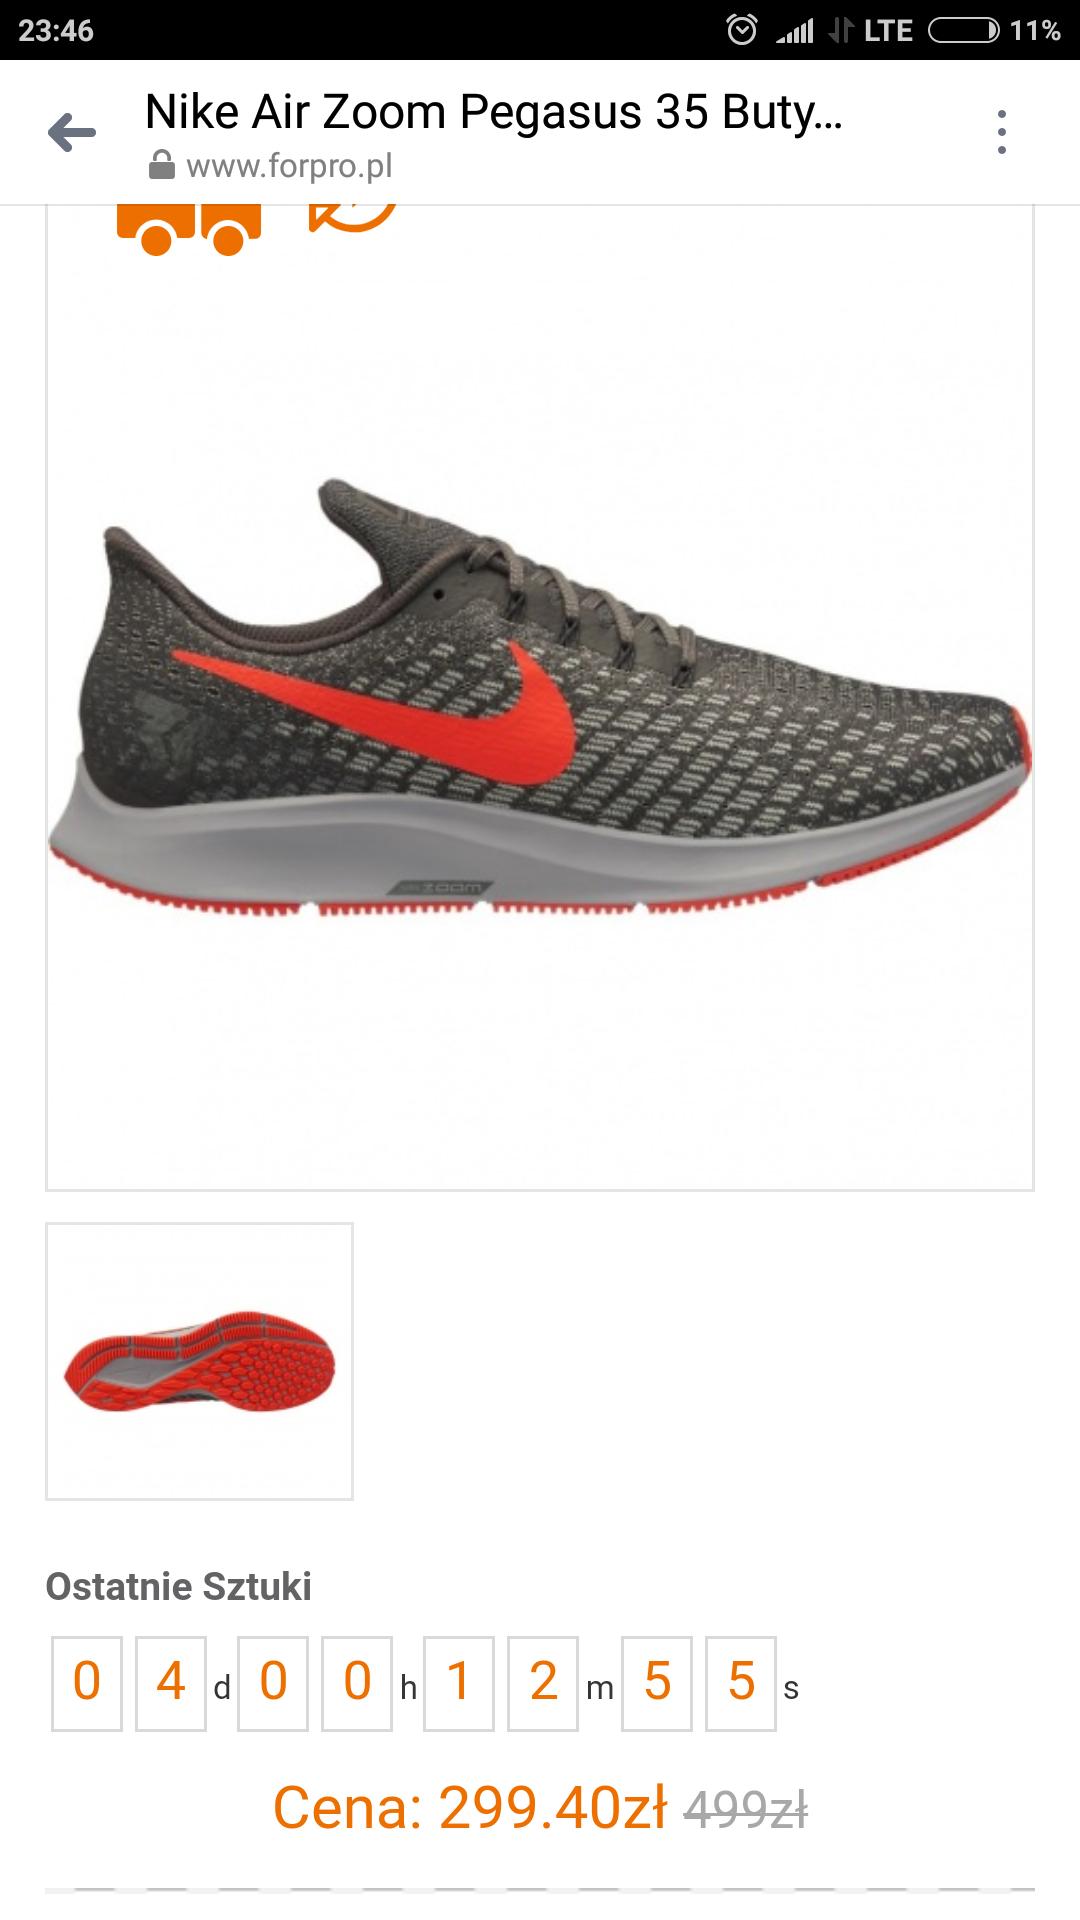 Nike Air Zoom Pegasus 35 - duże rozmiary - ost. sztuki